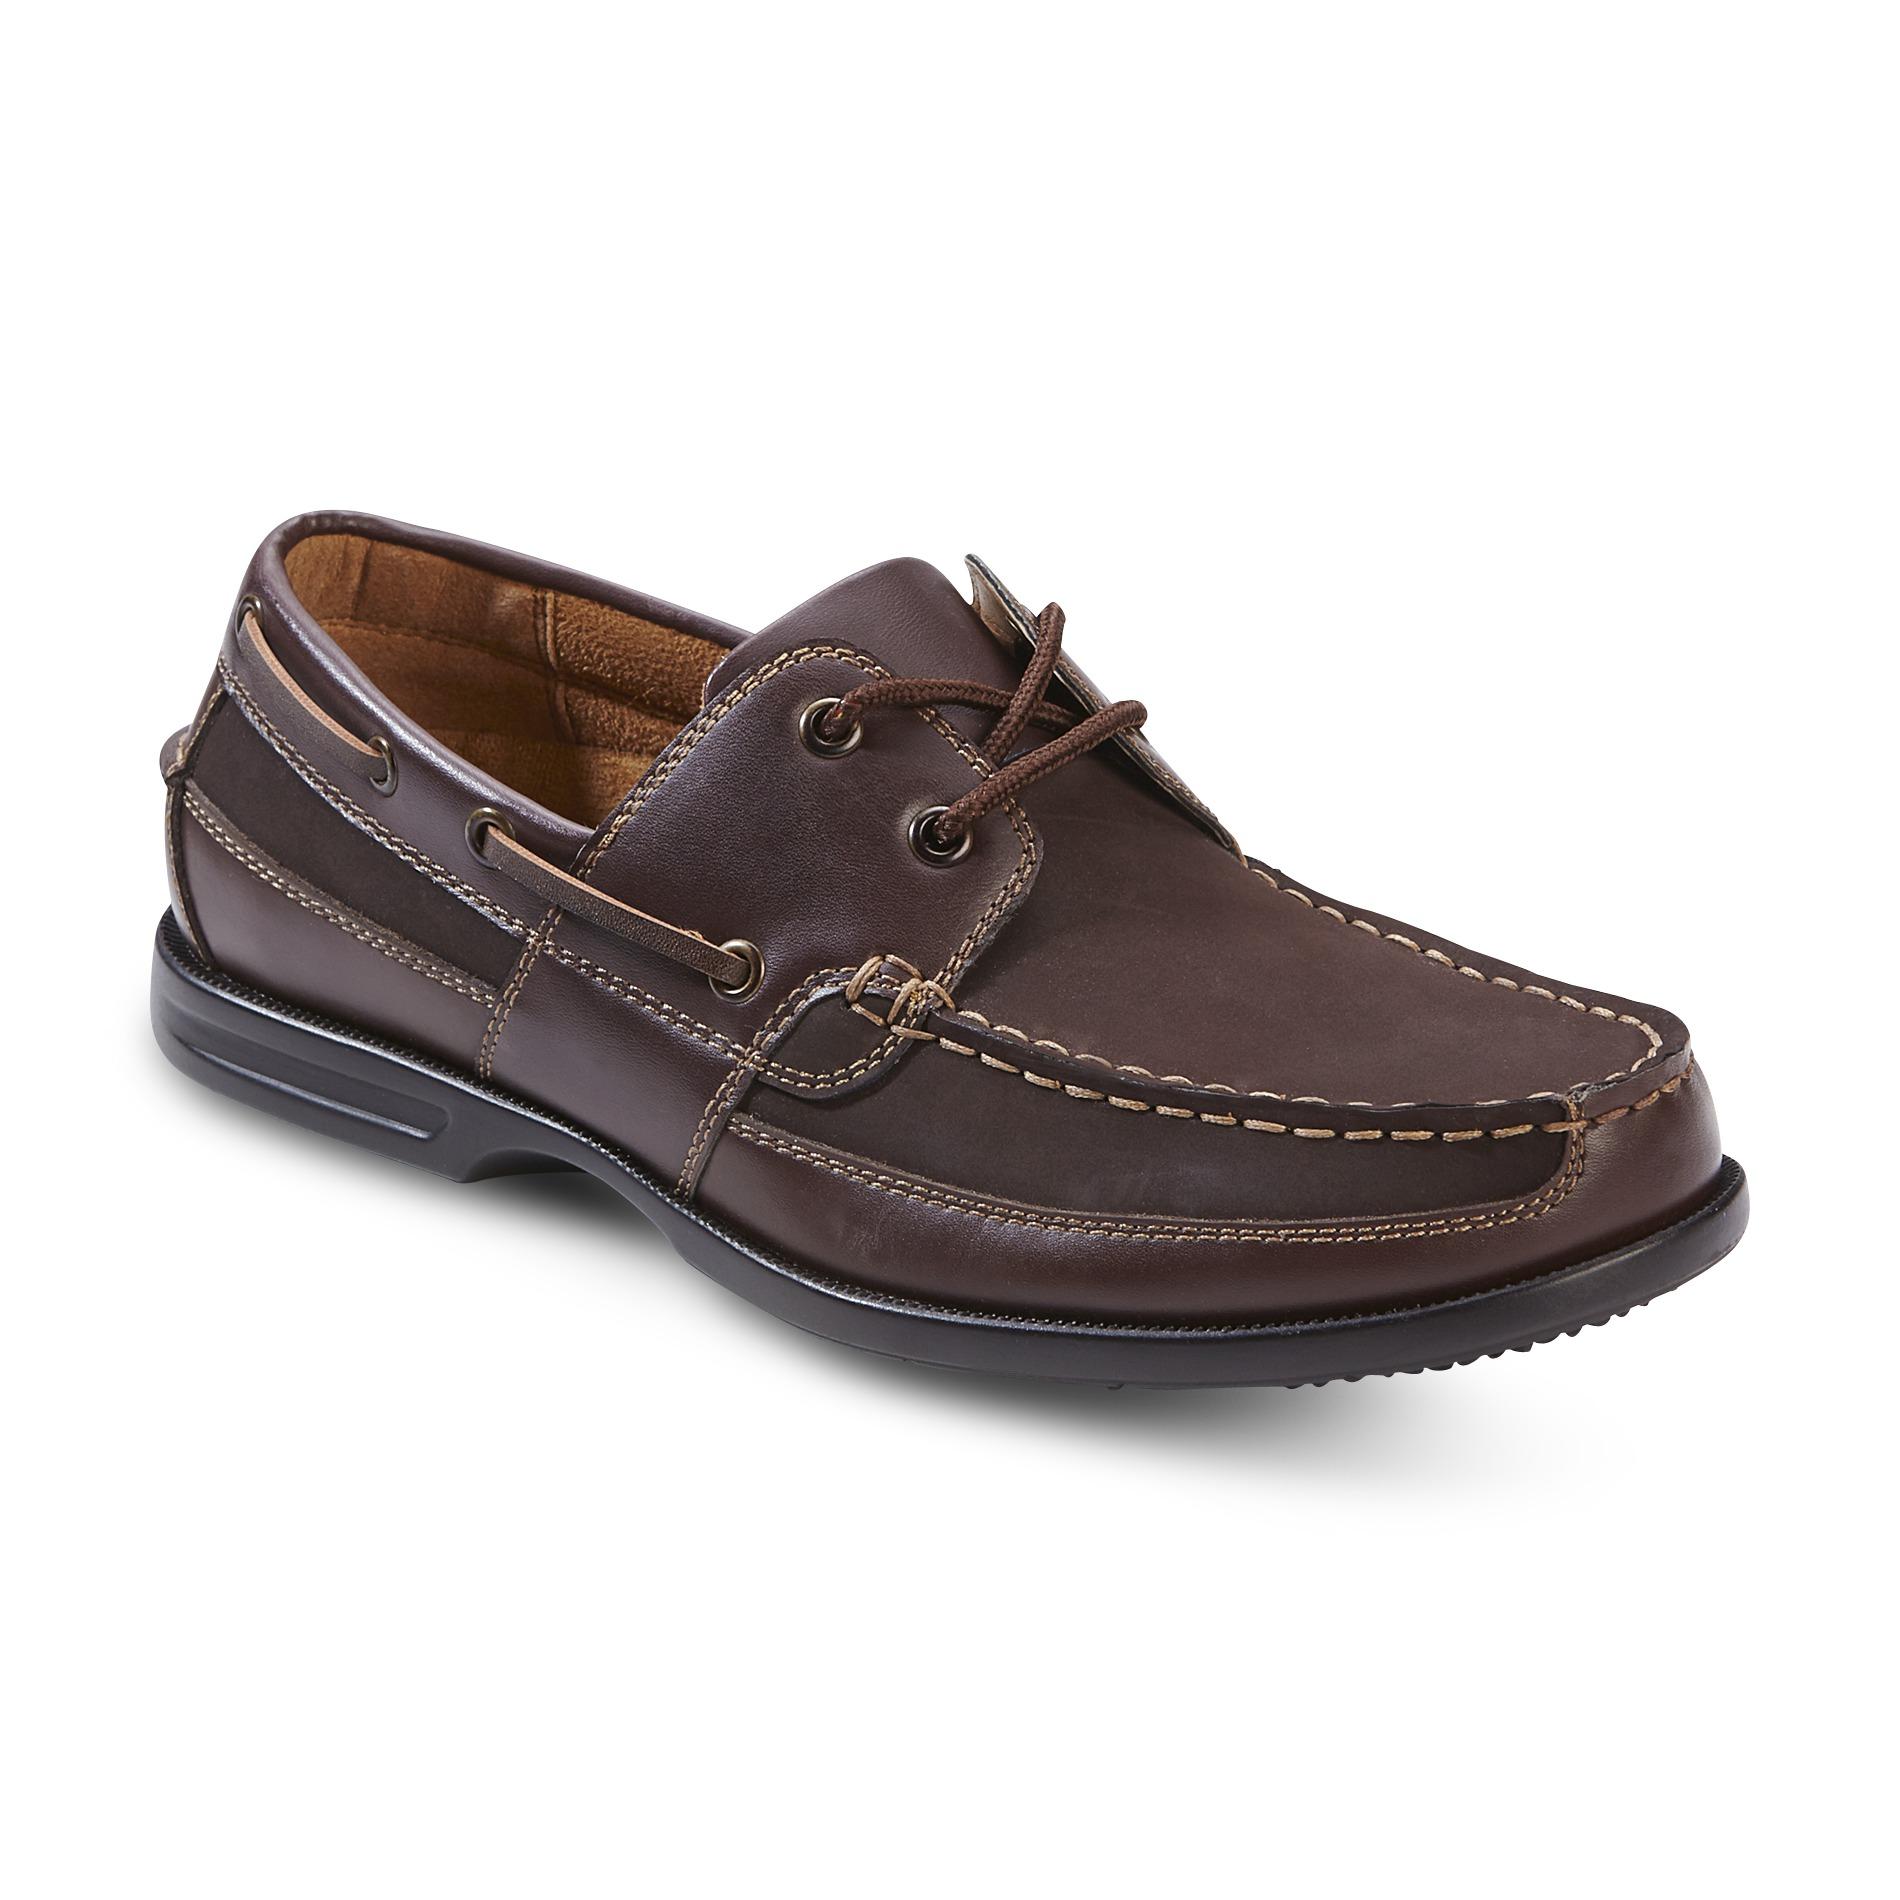 Nunn Bush Men S Avalon Nubuck Smooth Leather Boat Shoe